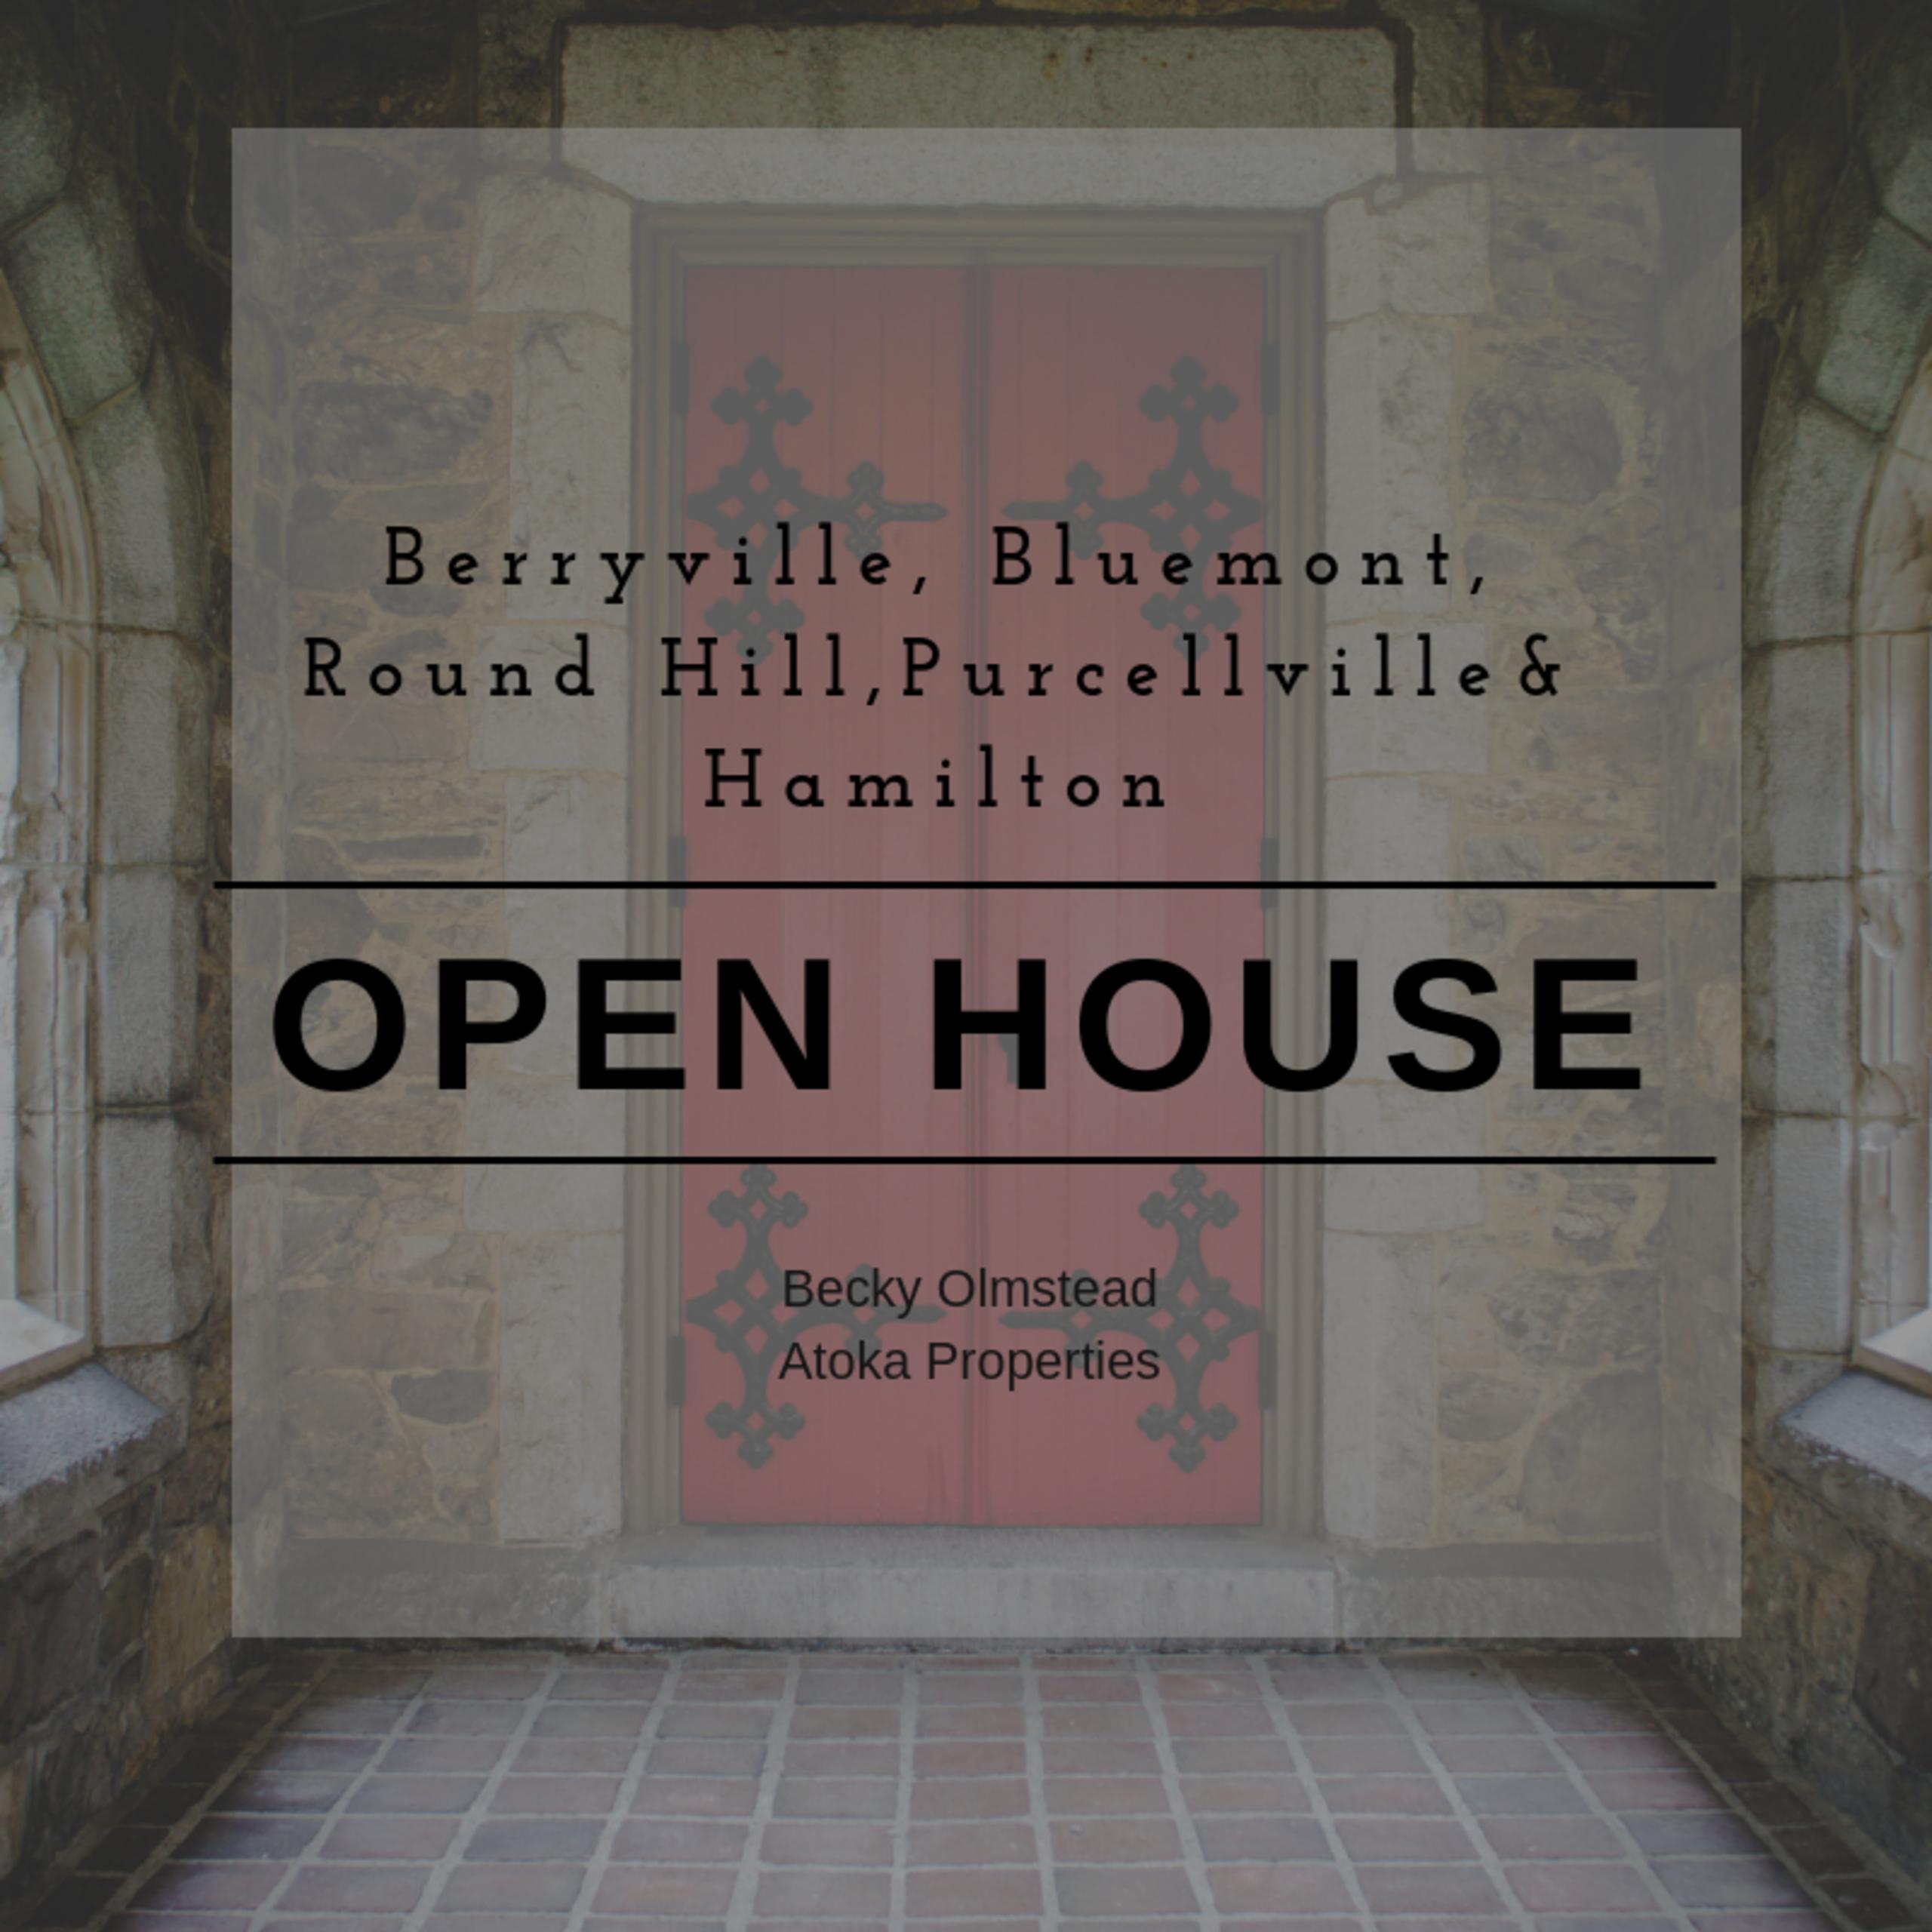 OPEN HOUSE LIST 10/13/18 – 10/14/18